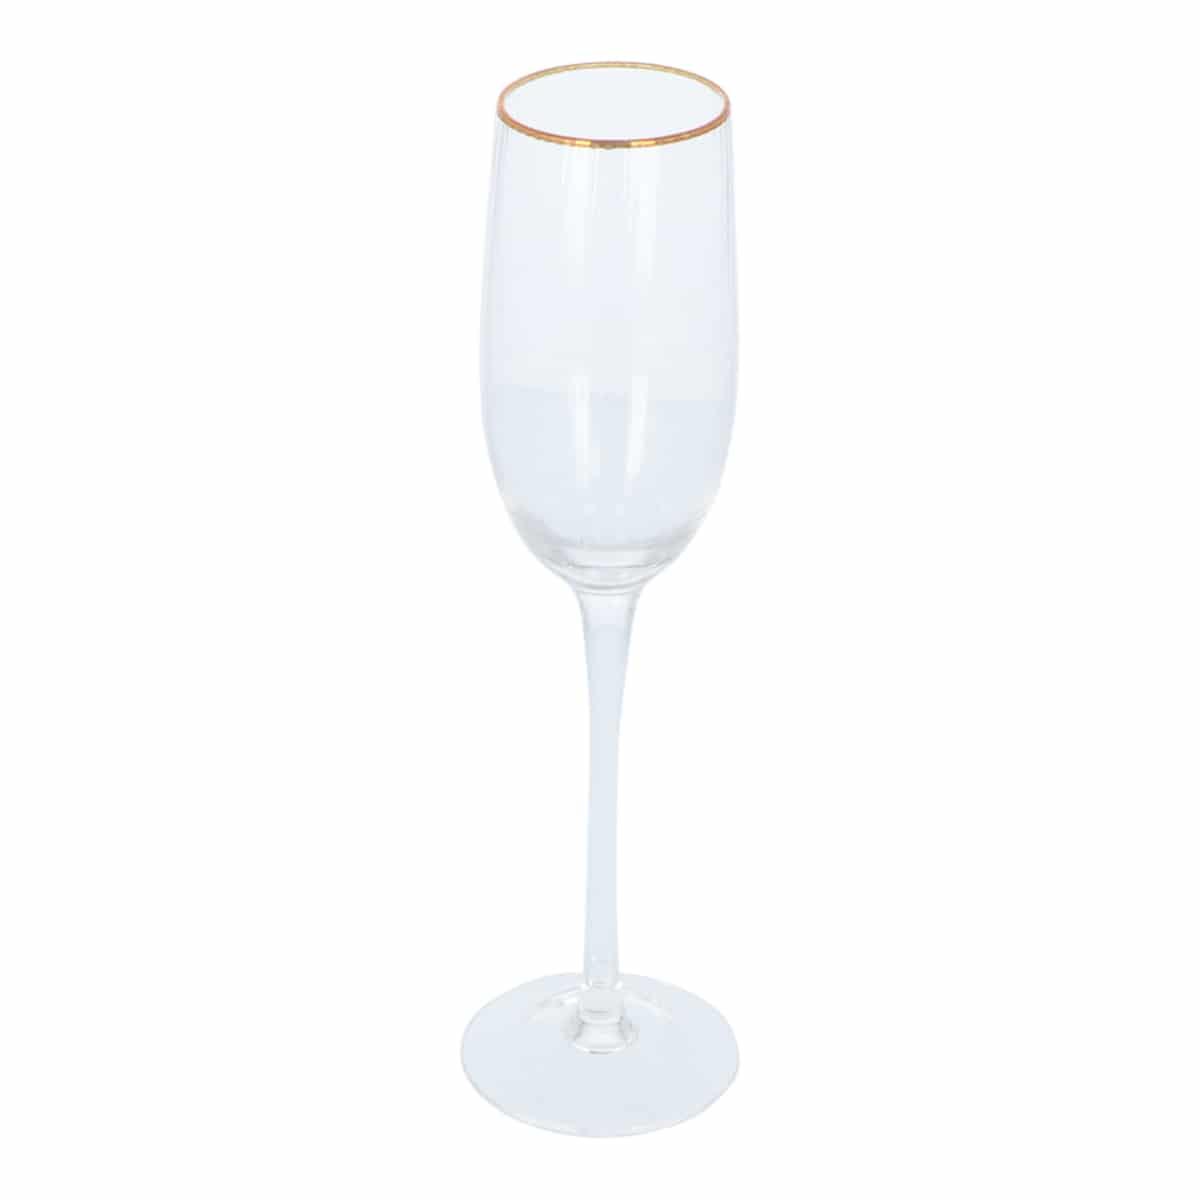 4goodz Petit Salon Champagne Flutes 6 stuks inh. 21 cl met Gouden rand